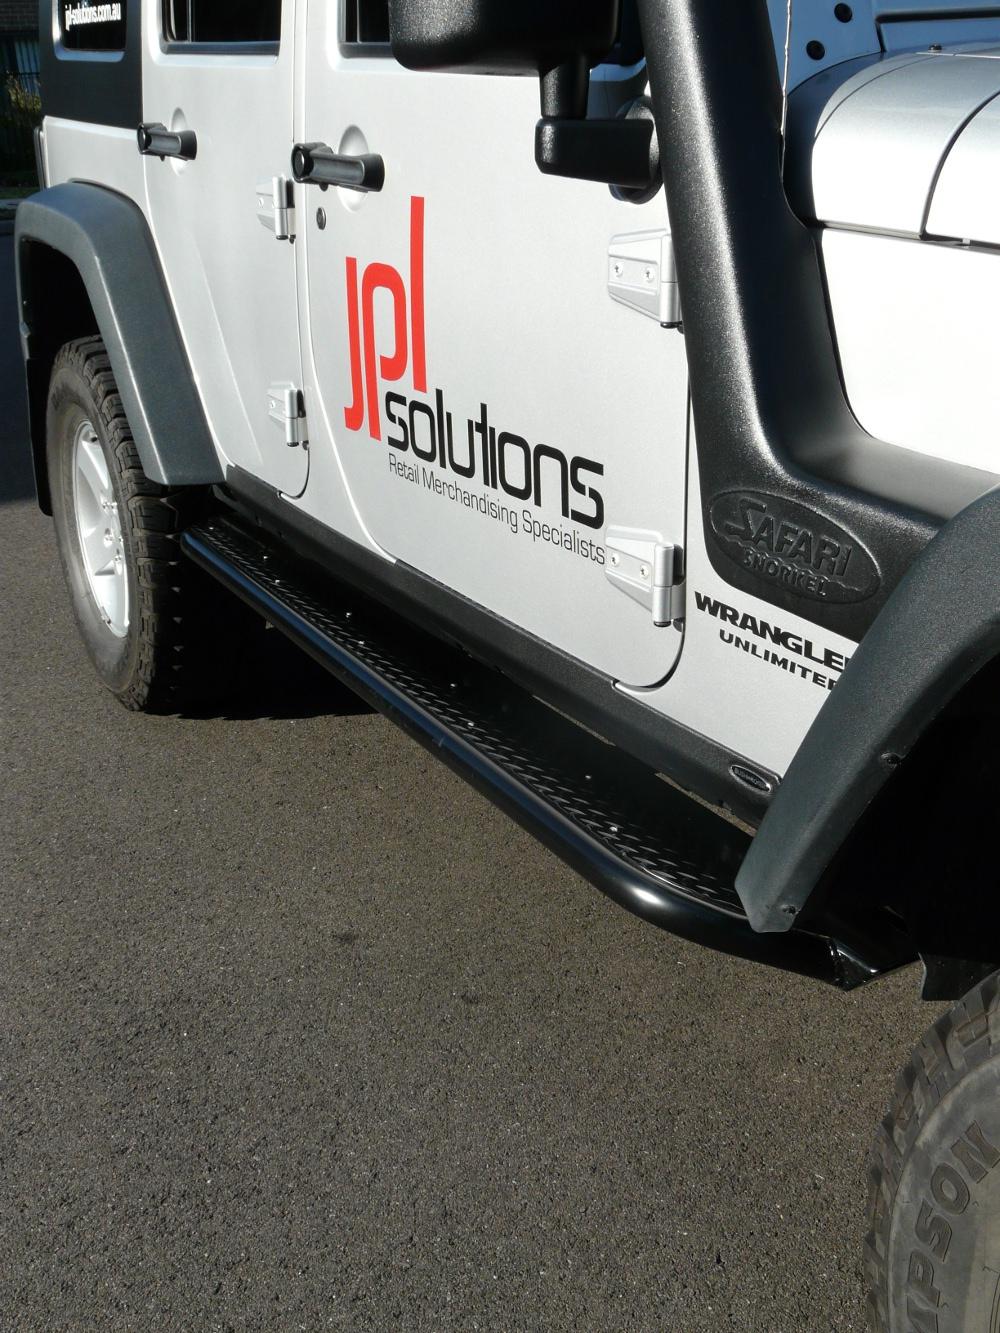 jeep-jk-unlimited-4-door-rock-sliders-white-knuckle-off-road-14